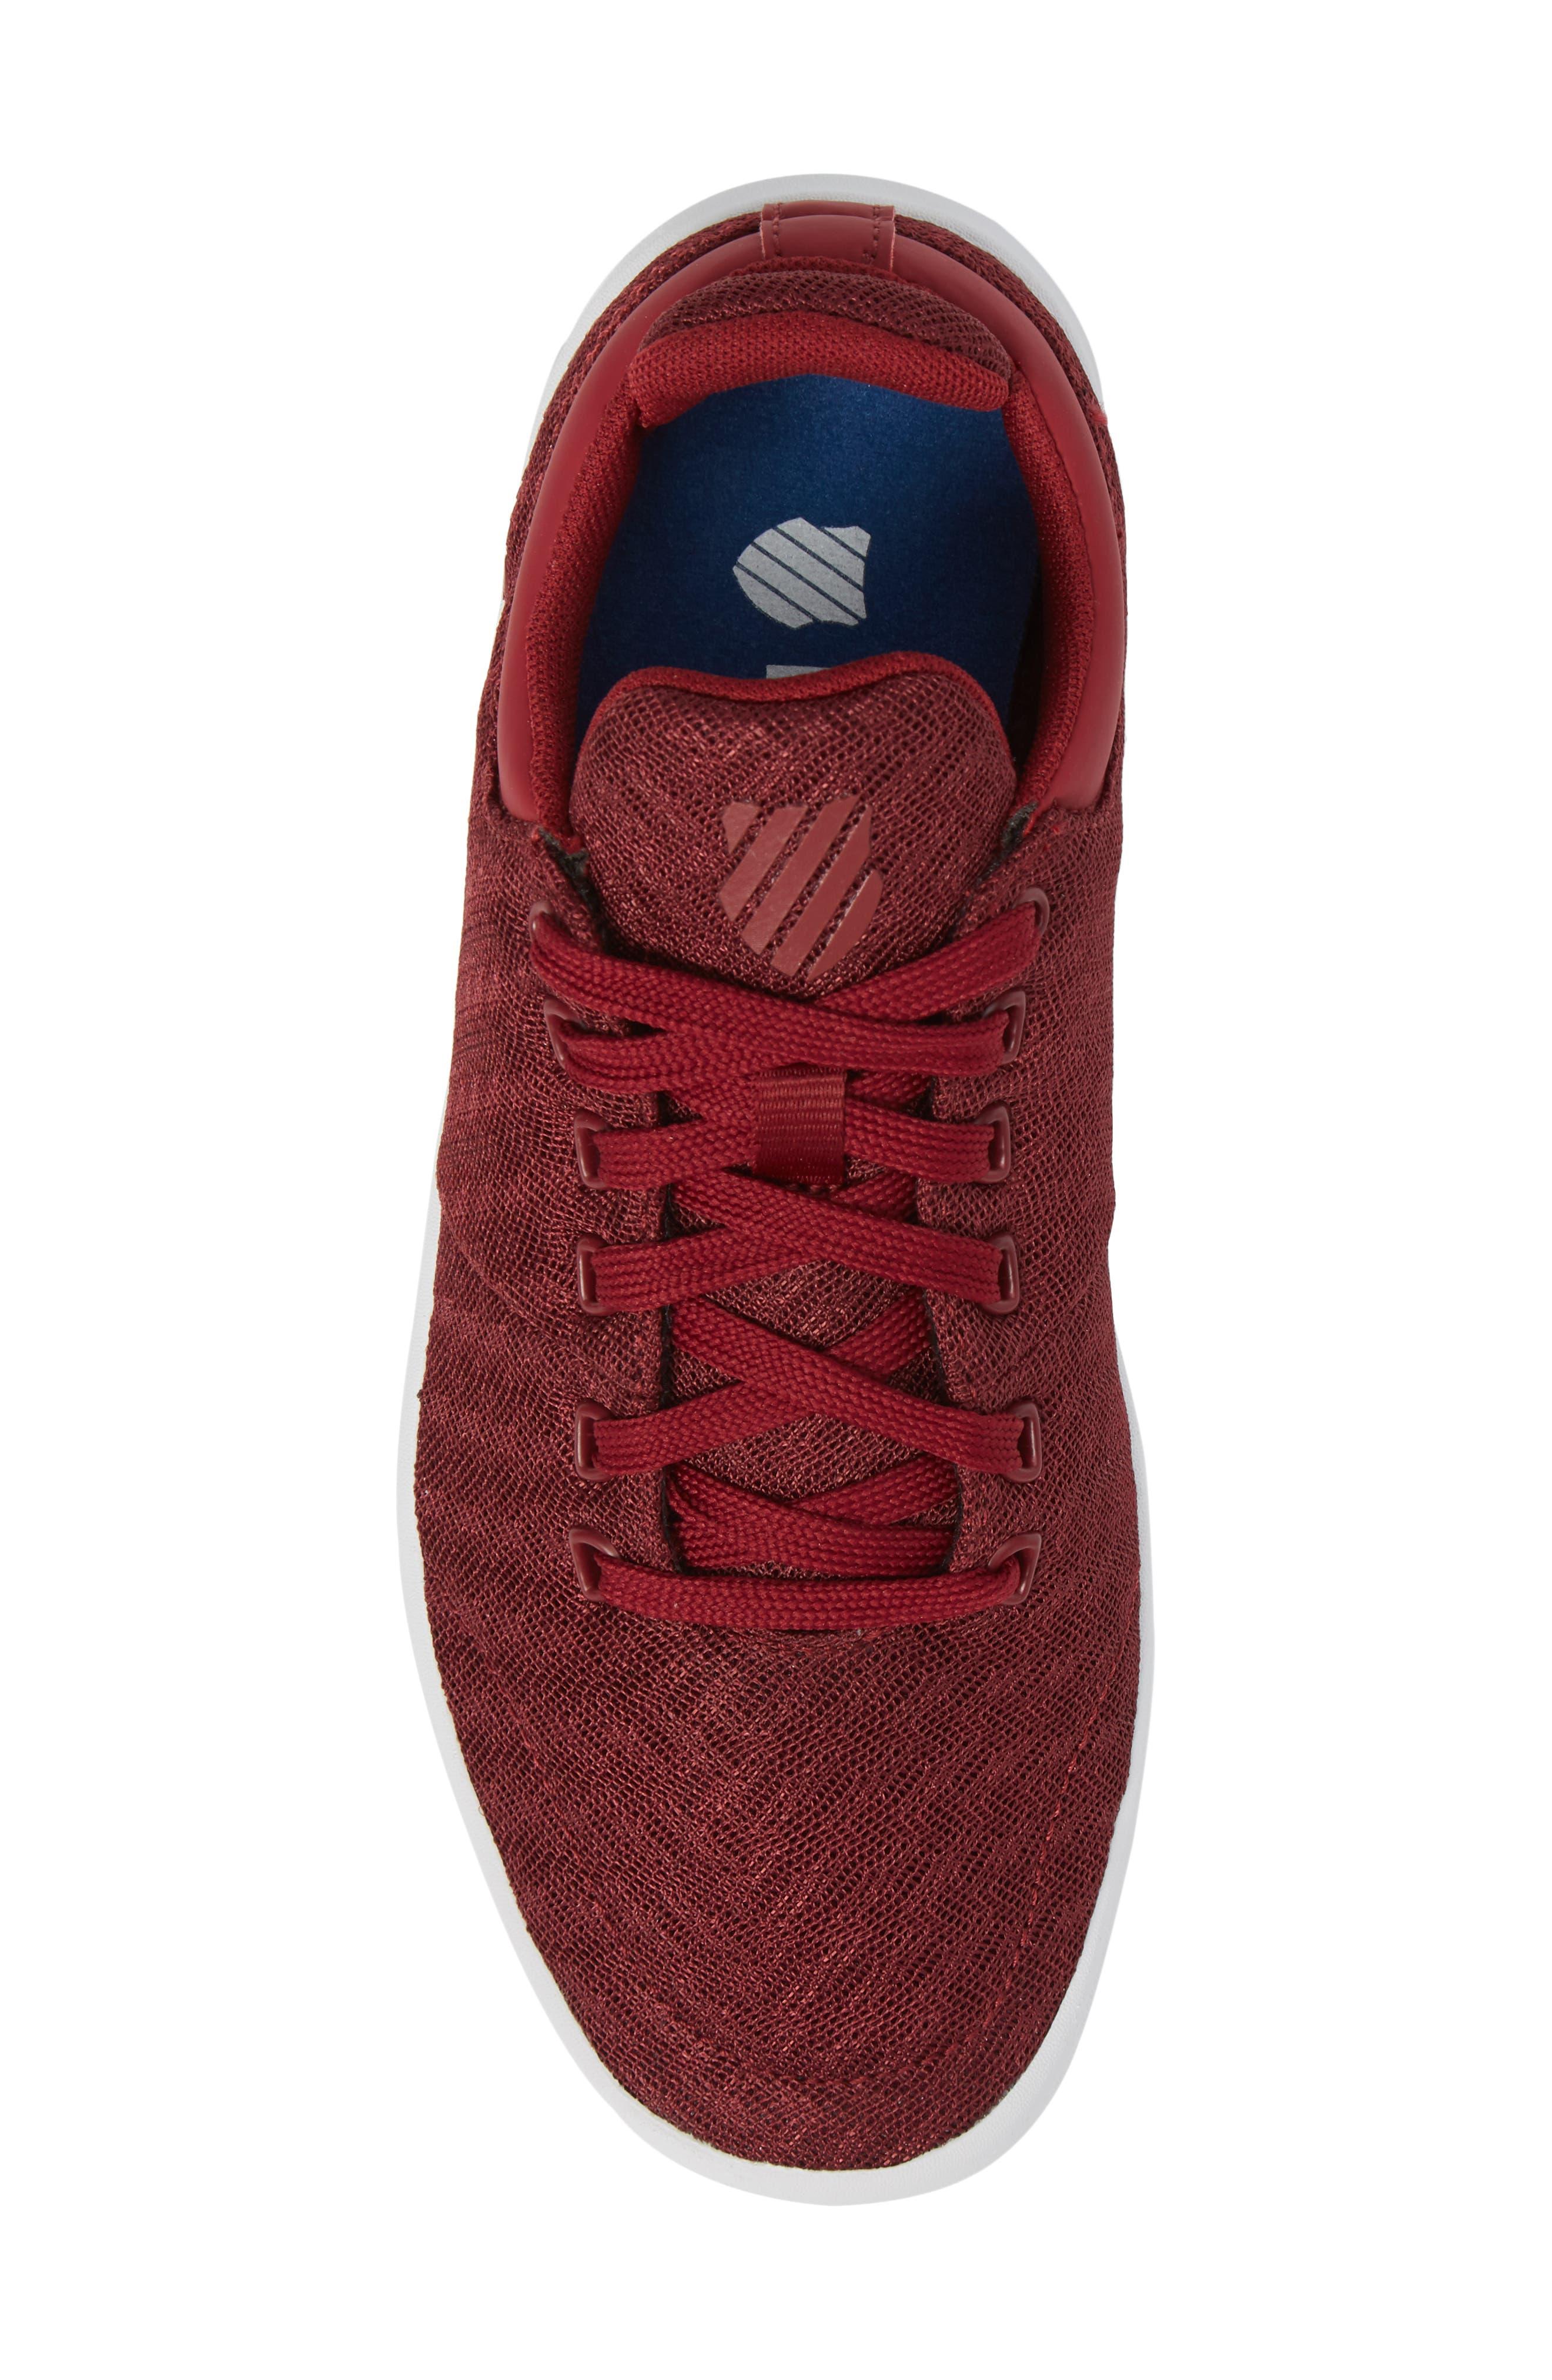 Aero Trainer T Sneaker,                             Alternate thumbnail 5, color,                             Tibetan Red/ White